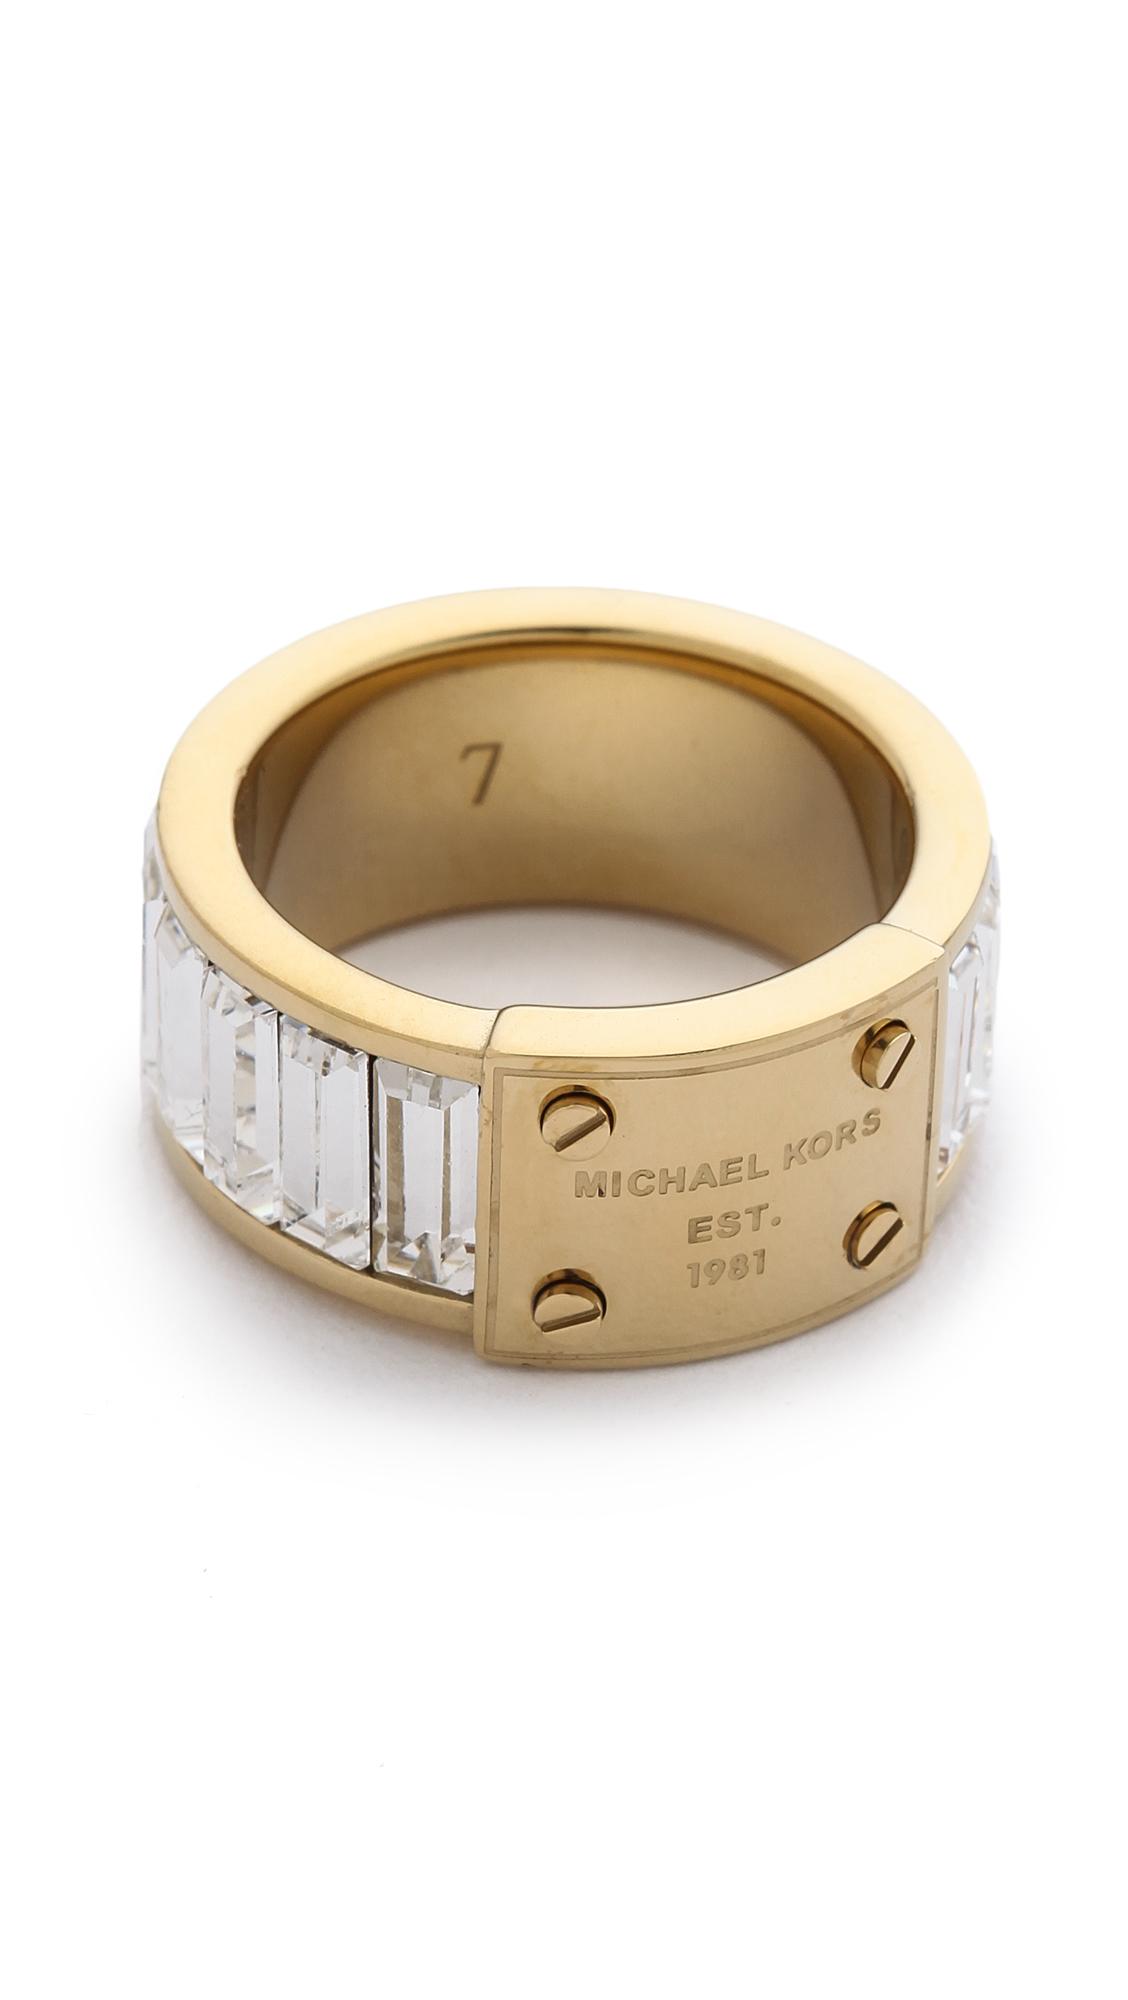 michael kors baguette plaque ring in gold gold clear lyst. Black Bedroom Furniture Sets. Home Design Ideas